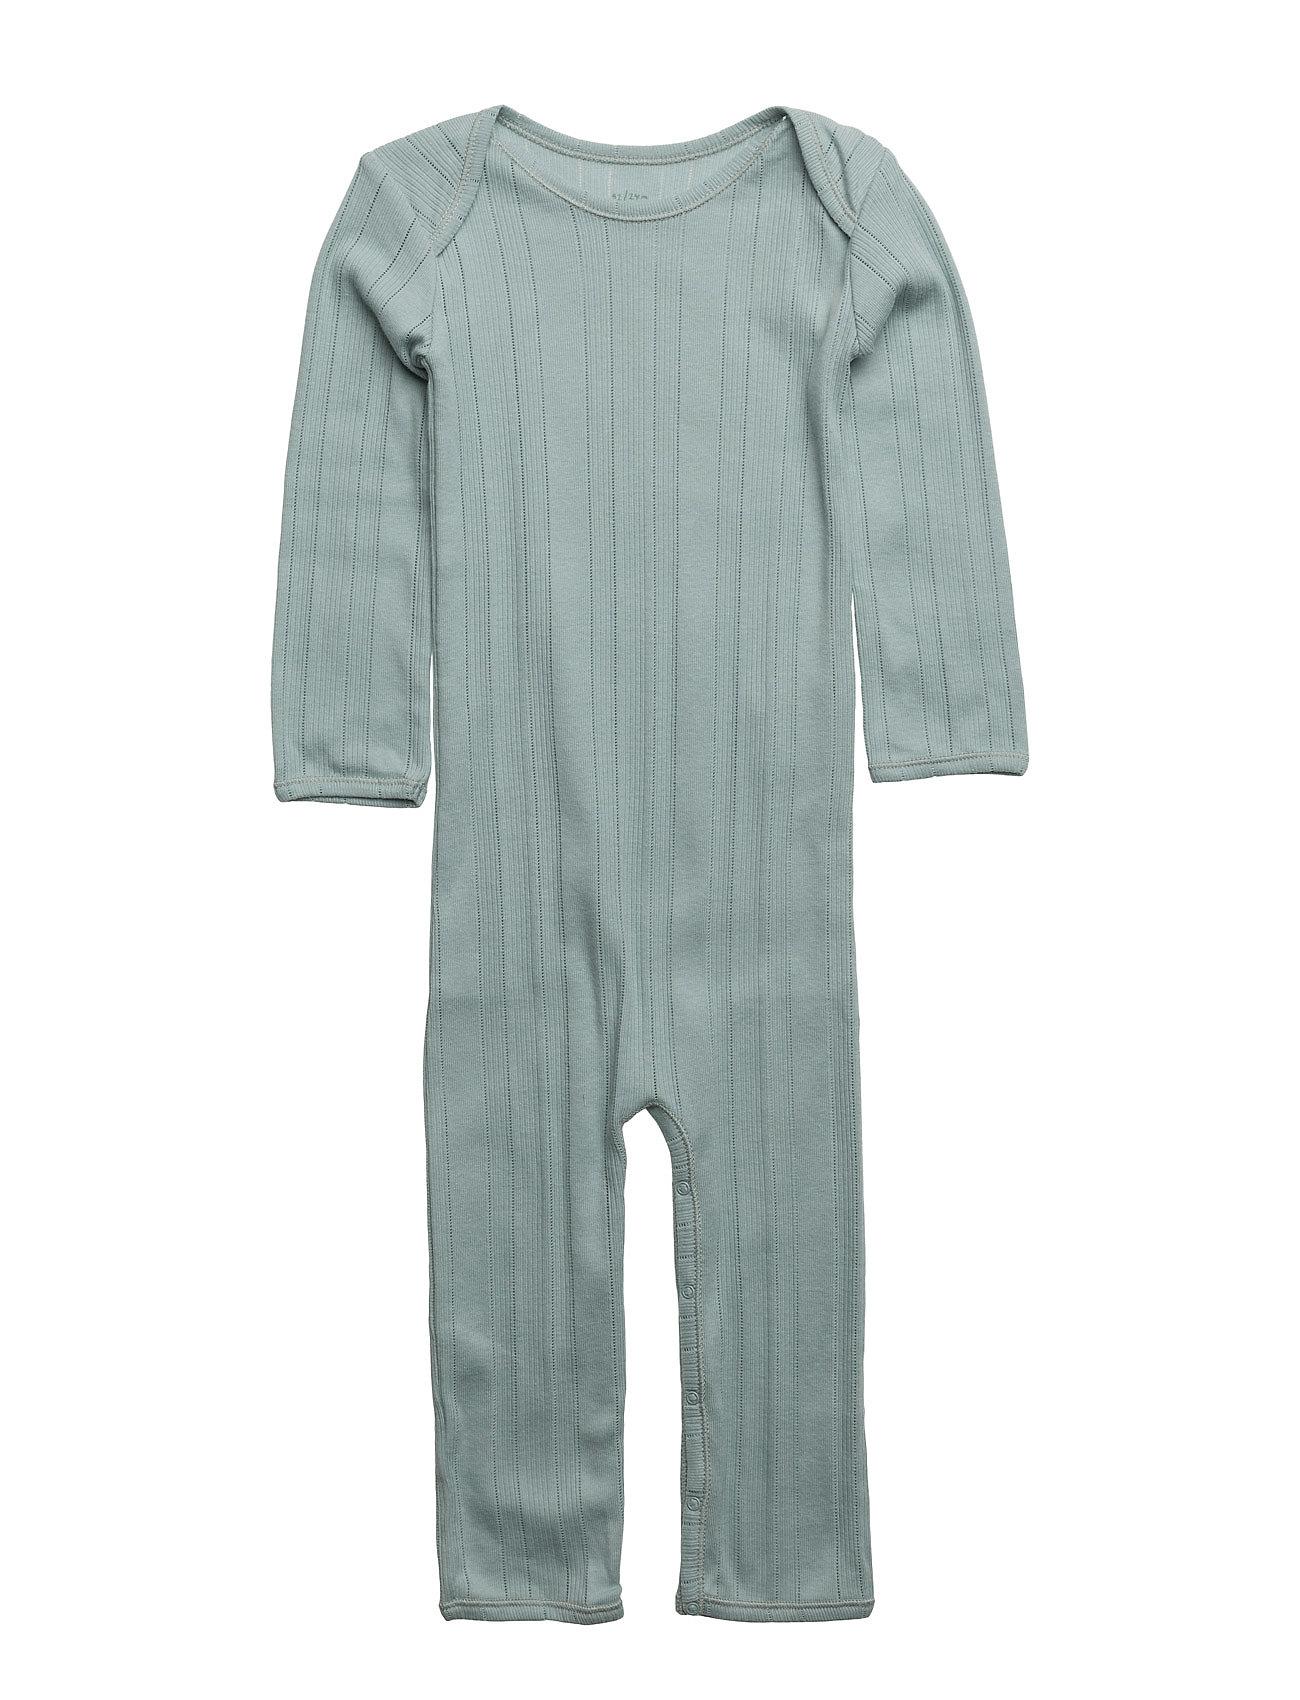 Jumpsuit Noa Noa Miniature Langærmede bodies til Børn i